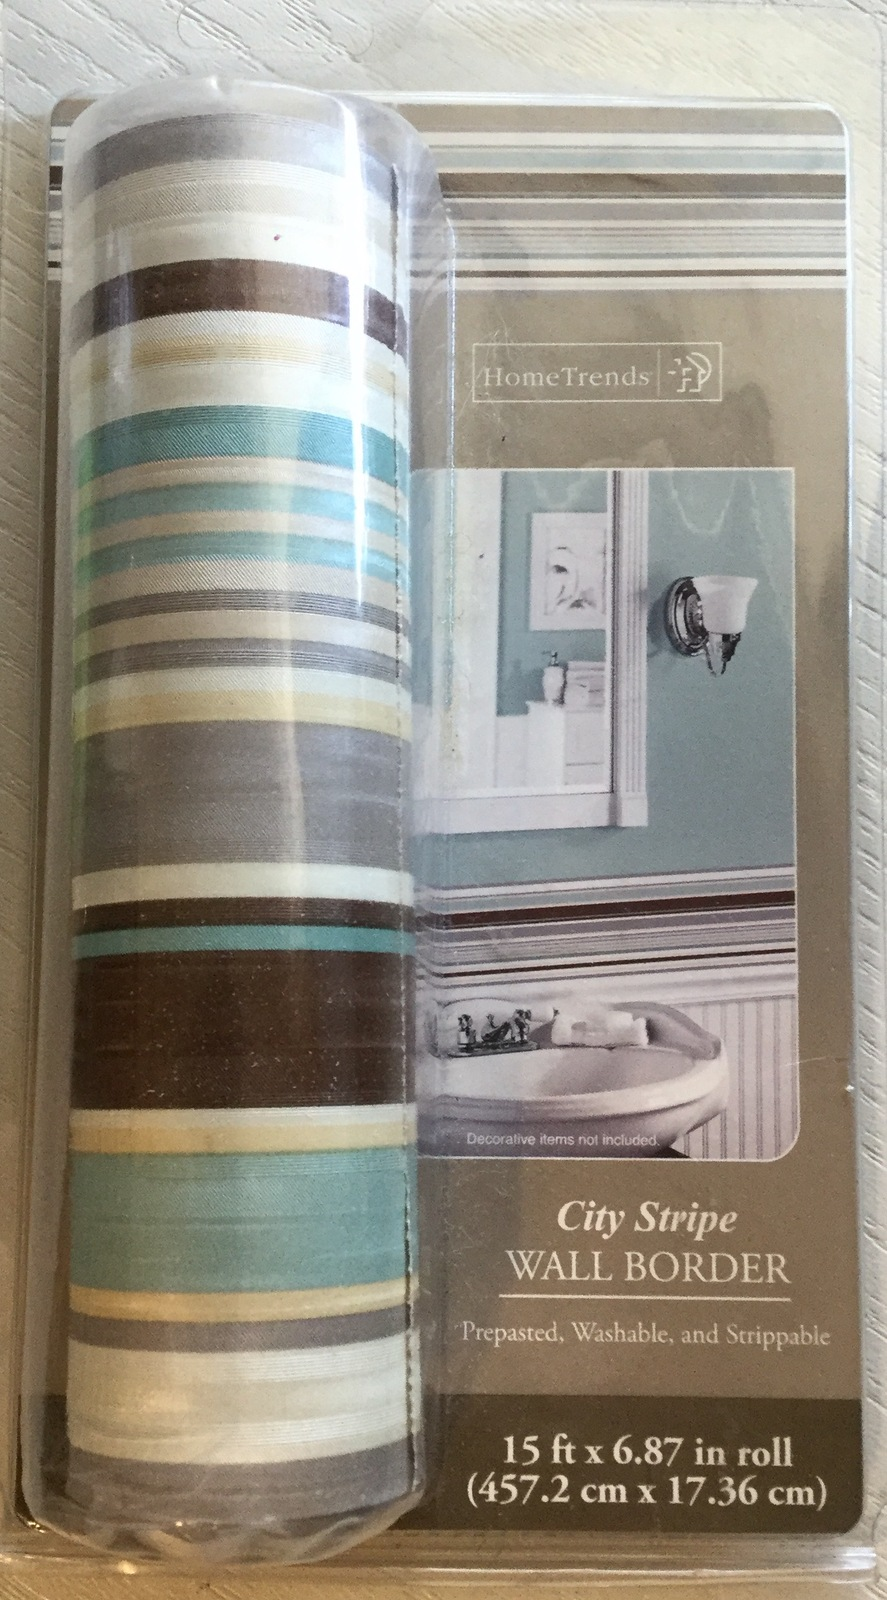 Home Trends Wallpaper Border 51740insn City Stripe